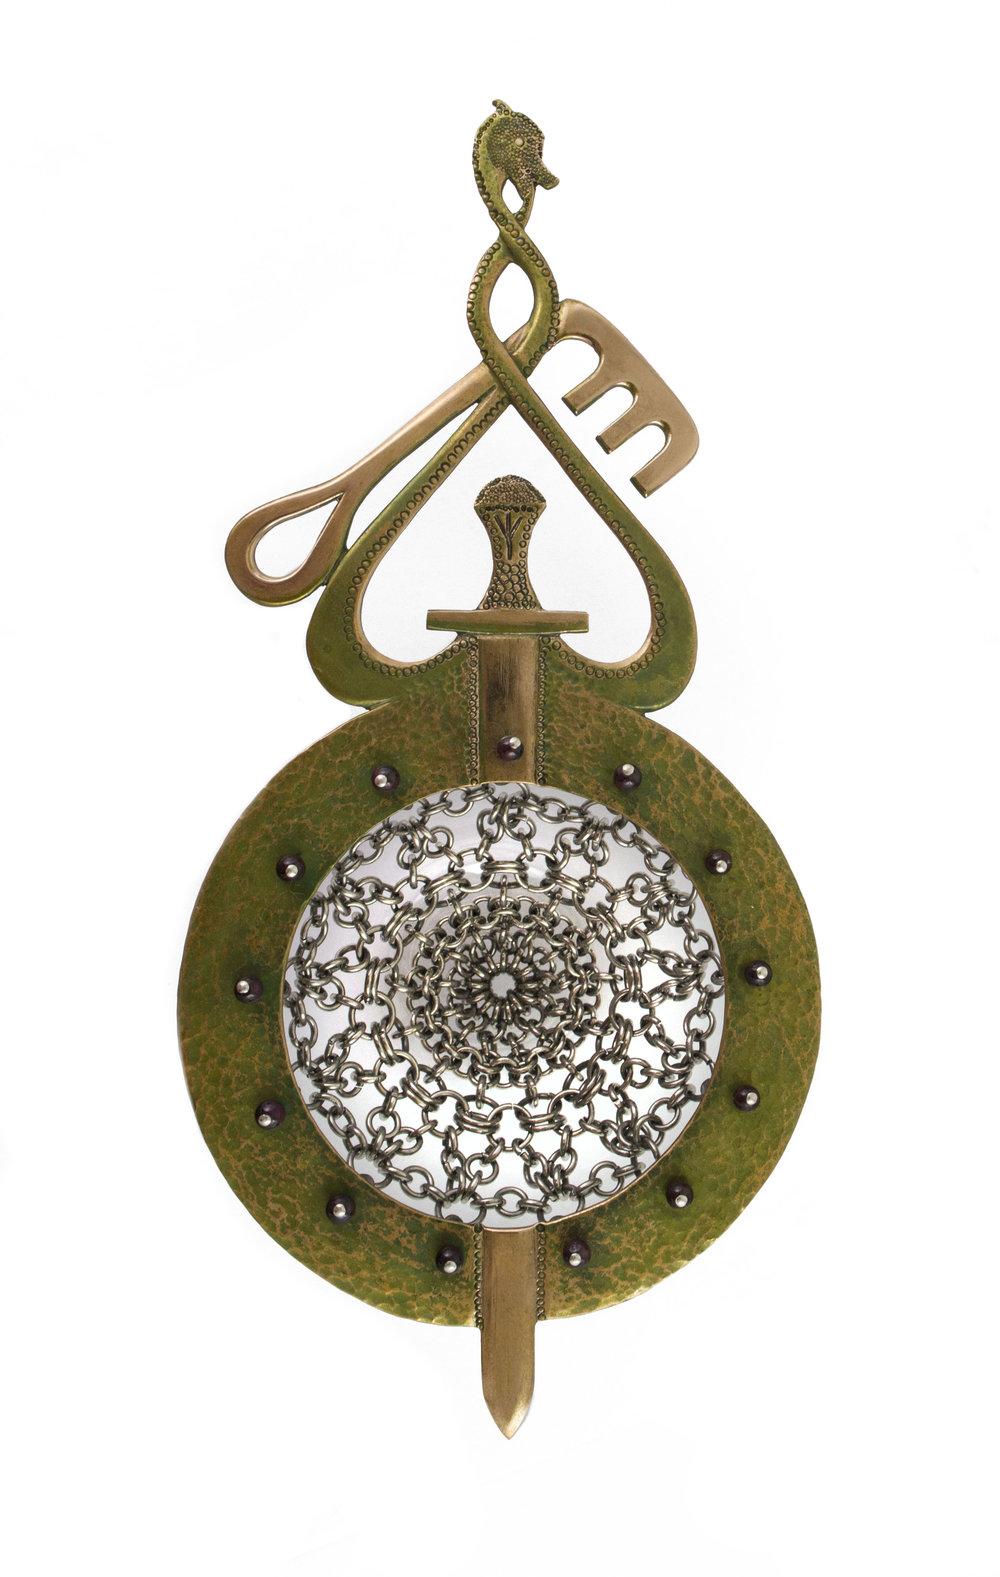 Maria Wolff   'Viking Key'Strainer  Bronze, stainless steel, sterling silver, garnet